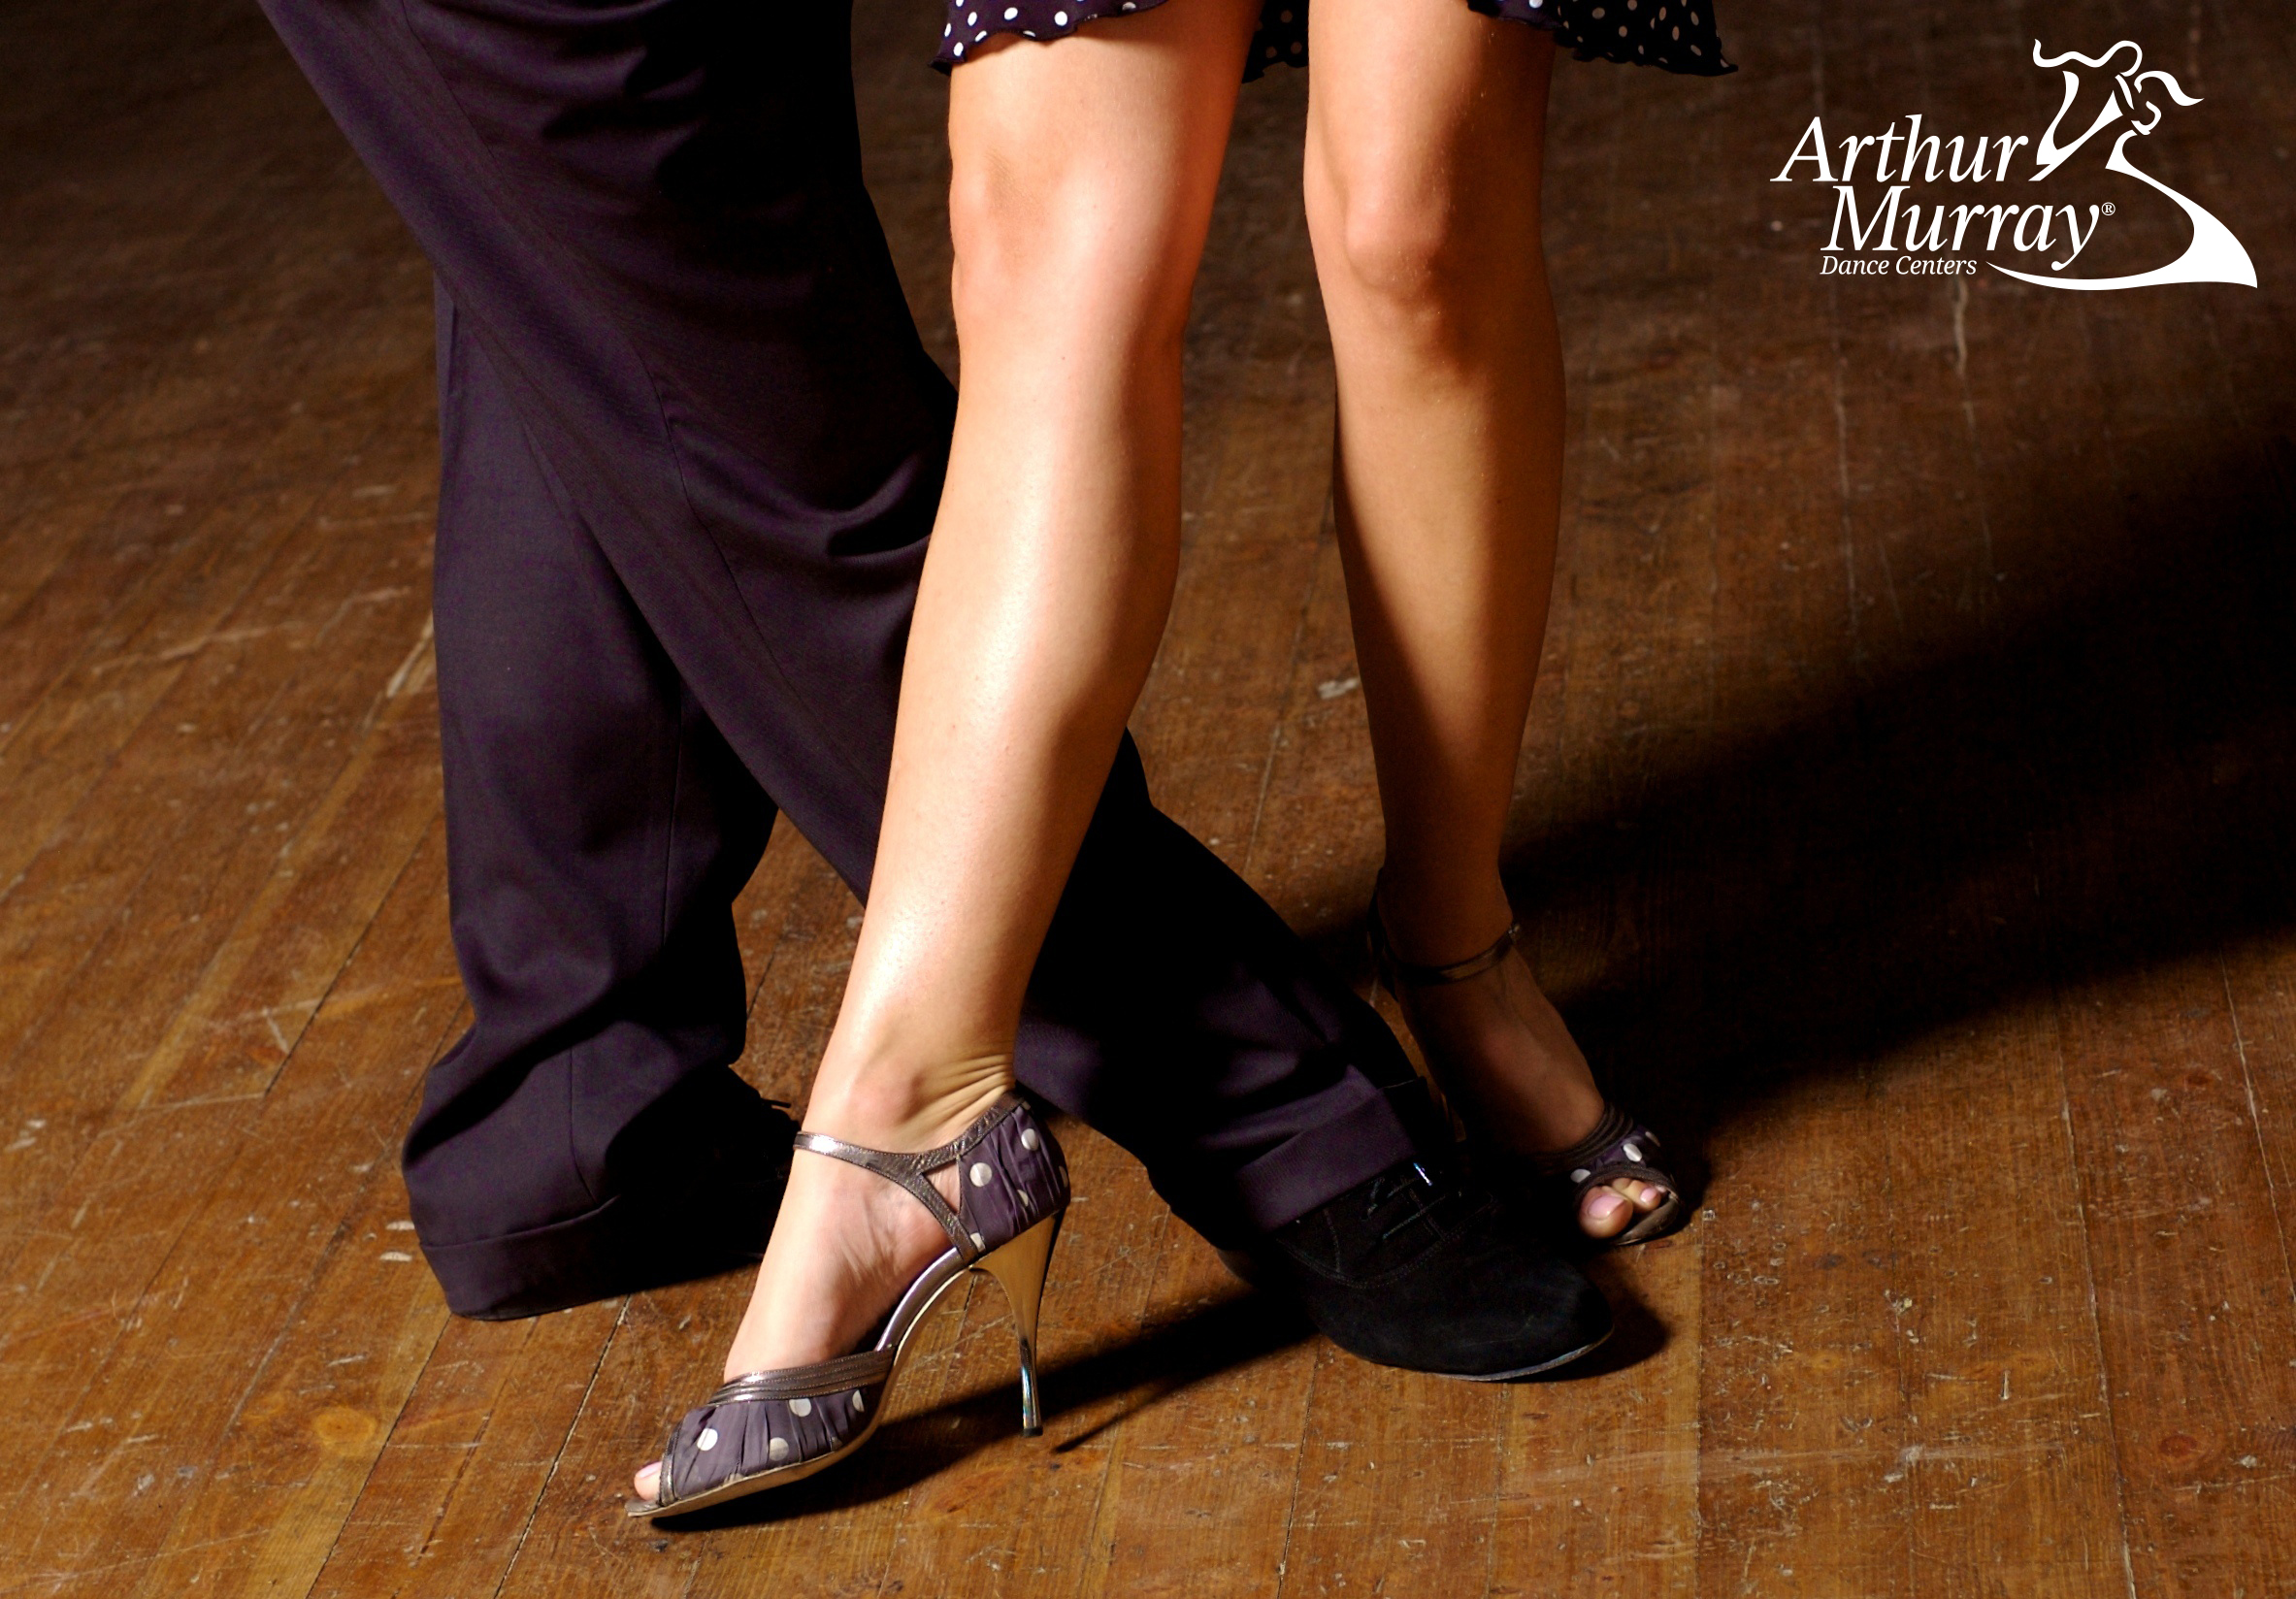 http___arthurmurrayfranchisee.com_system_files_DancingFeetPolkaDots_0.jpg